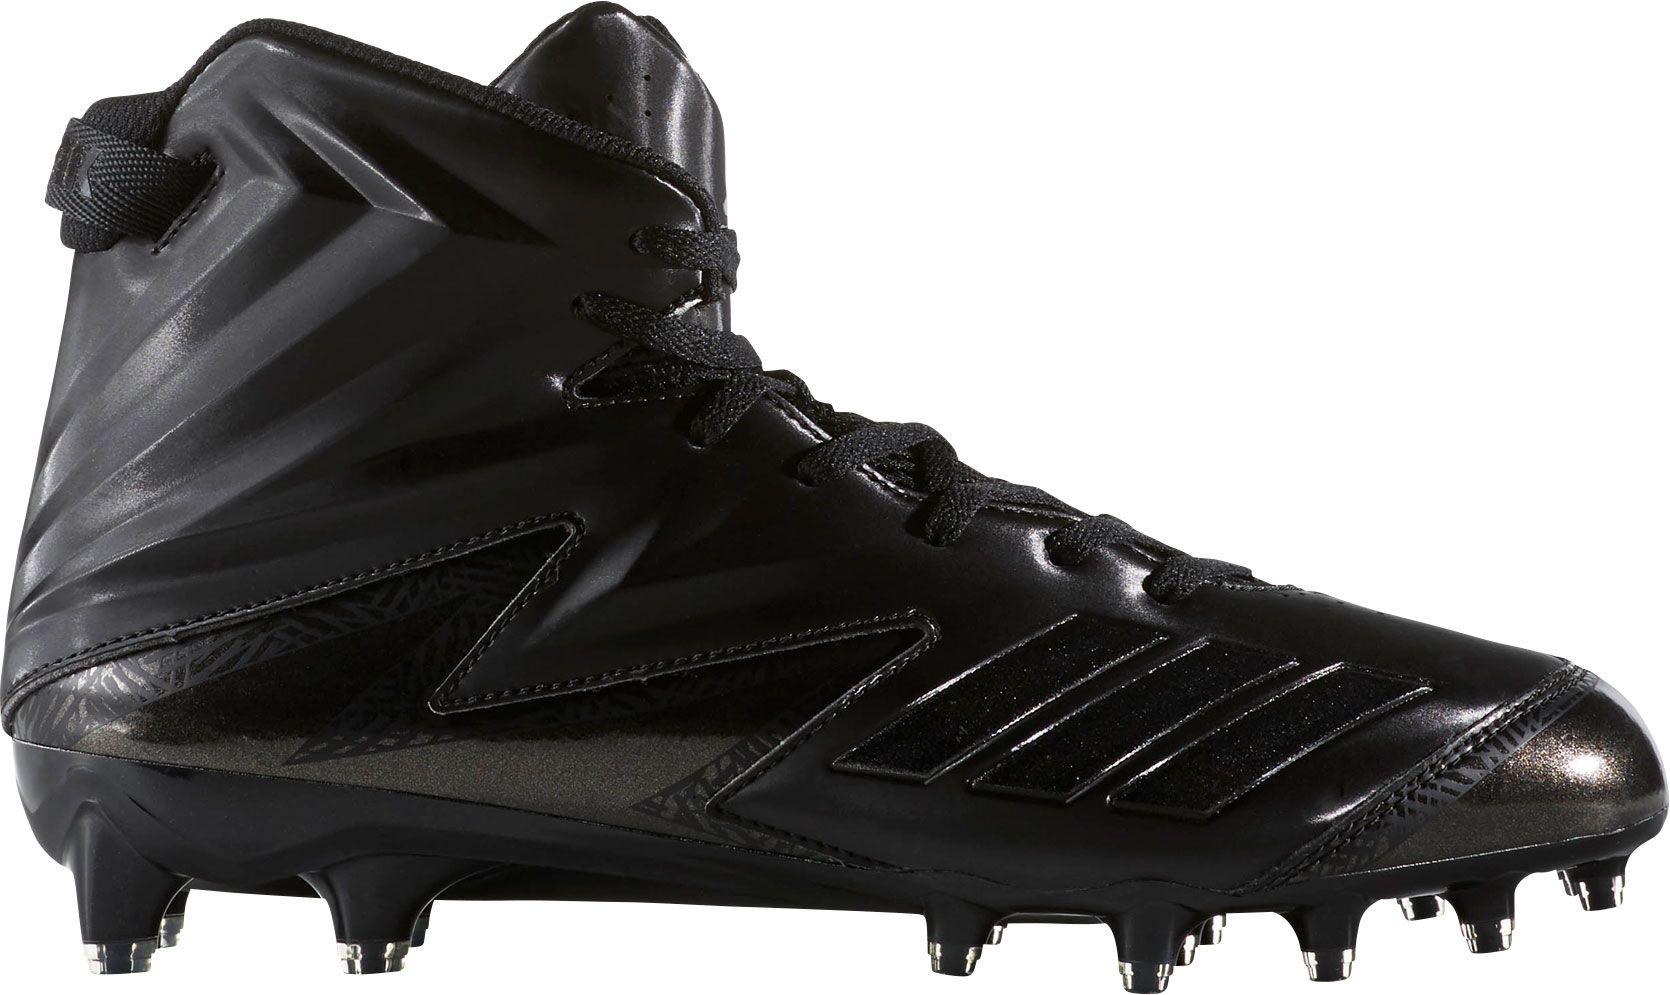 a2fb73fd394 70%OFF adidas Mens Freak X Carbon High Football Cleats DICKS Sporting Goods